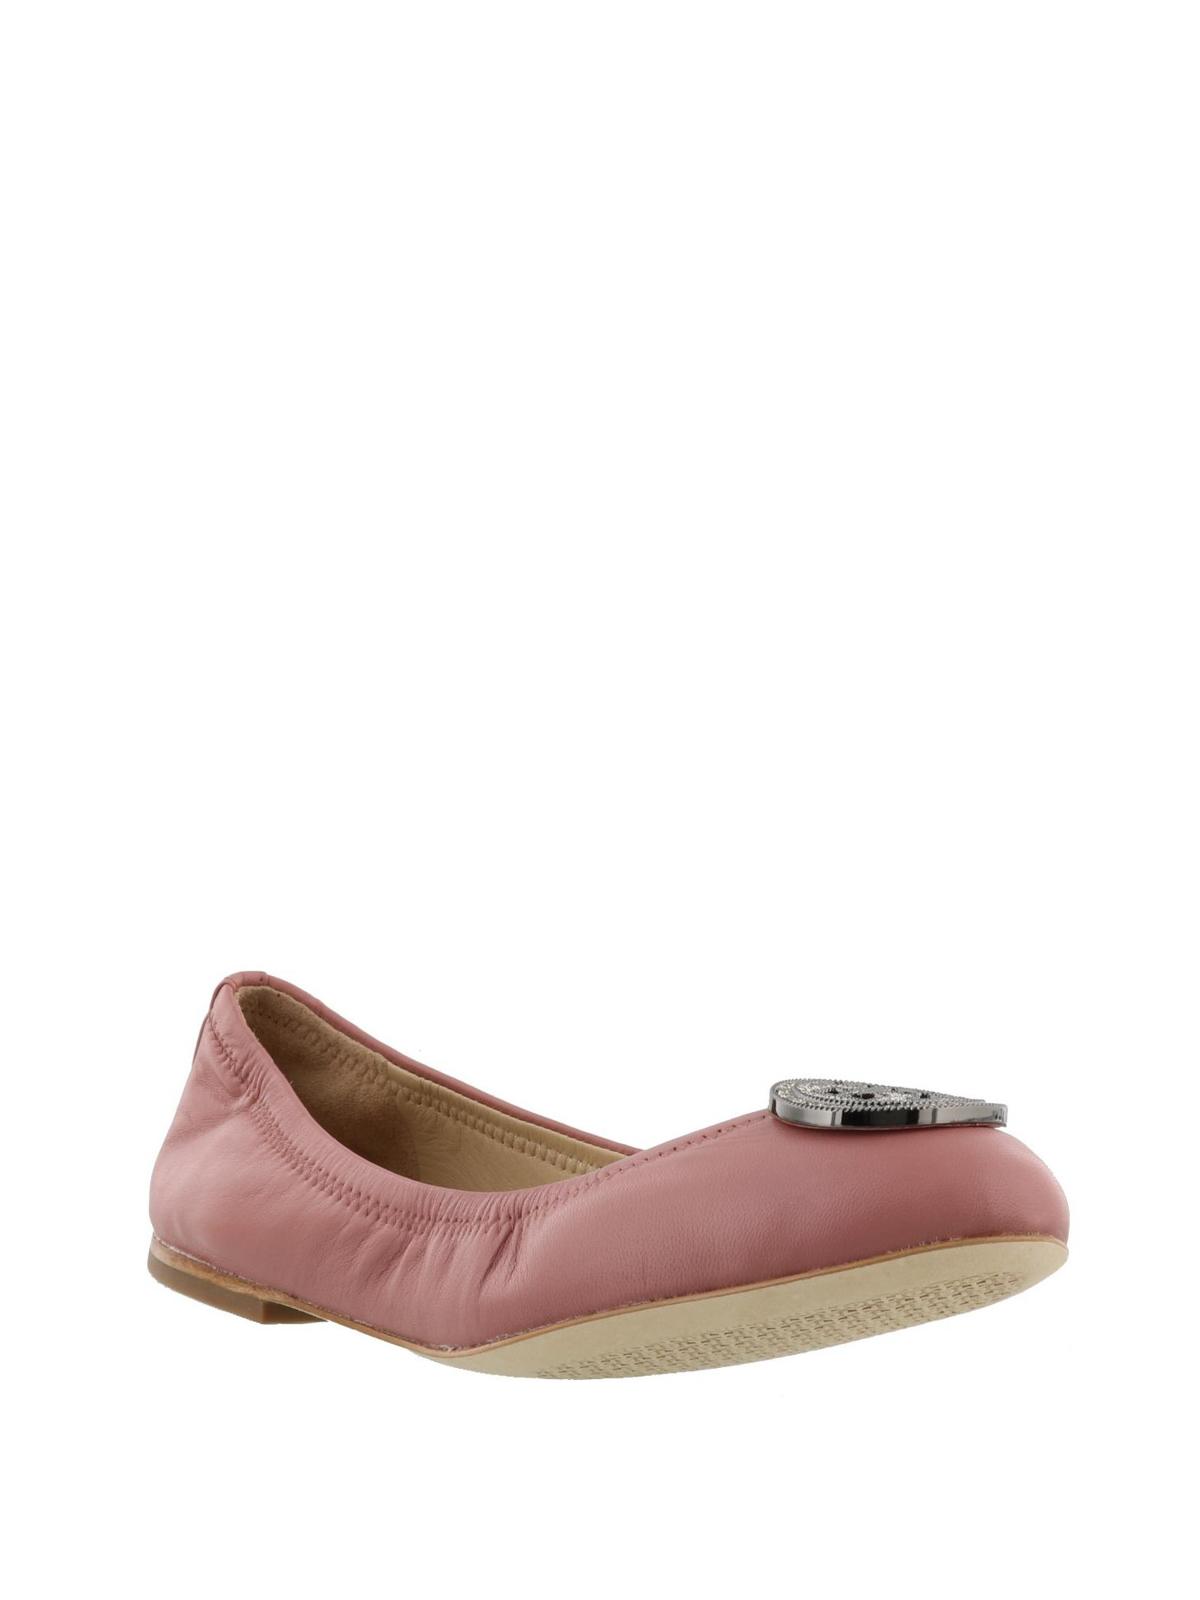 fc2d2ce137c Tory Burch - Liana pink leather flat shoes - flat shoes - 46084 651